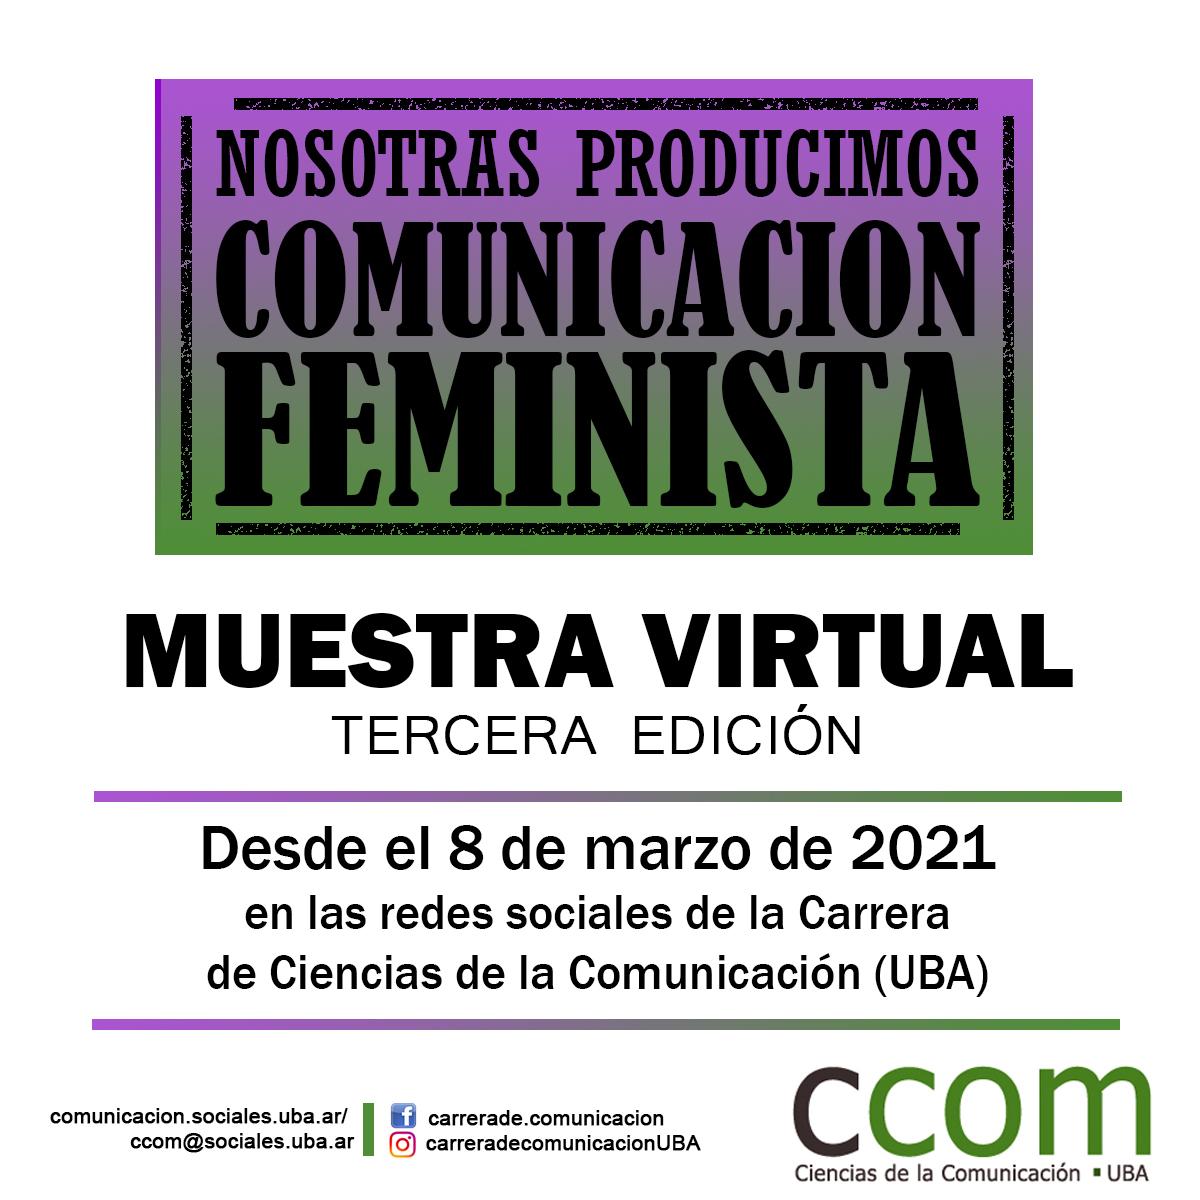 Muestra virtual de comunicación feminista